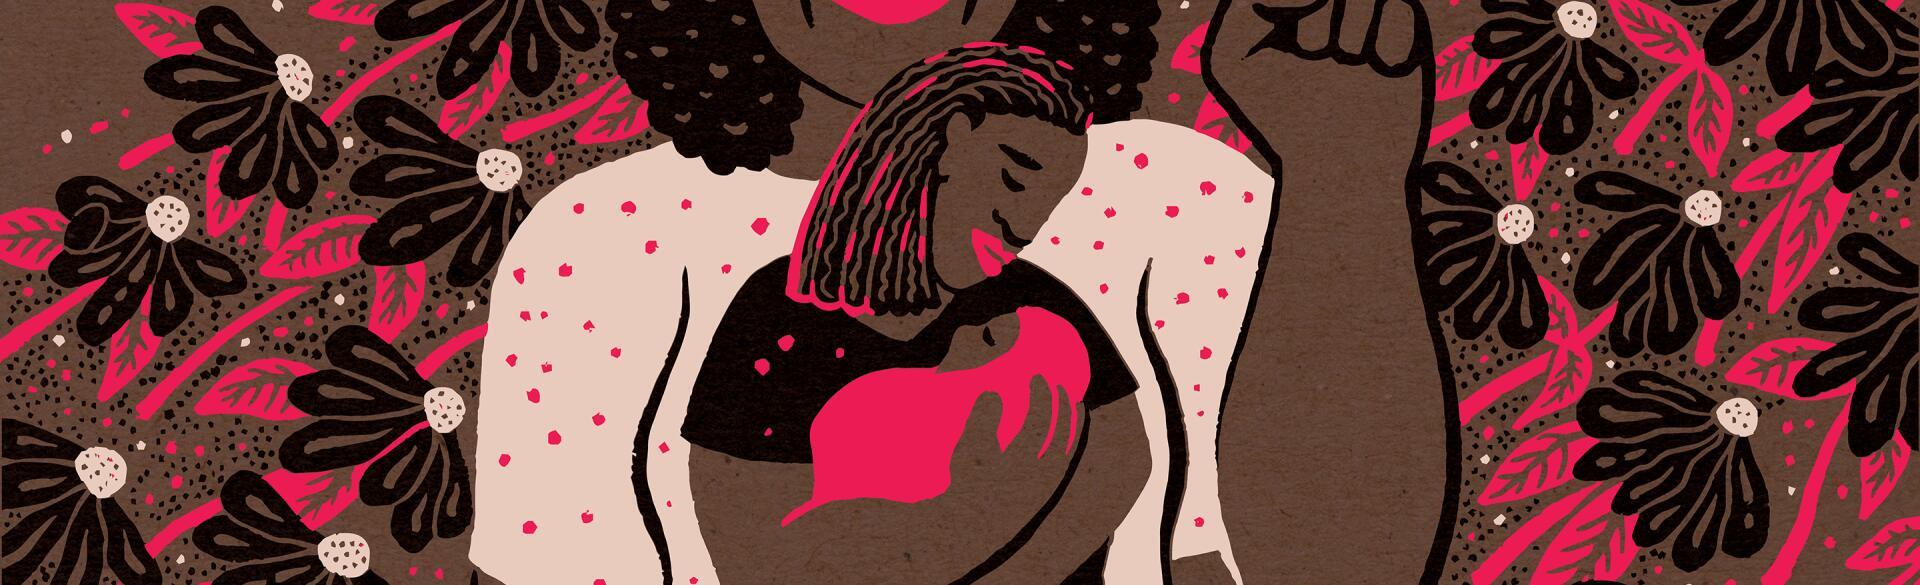 Grandma_Daughter_grandchild_solidarity_florals_illustration_simone_newberry_martin_1440.jpg